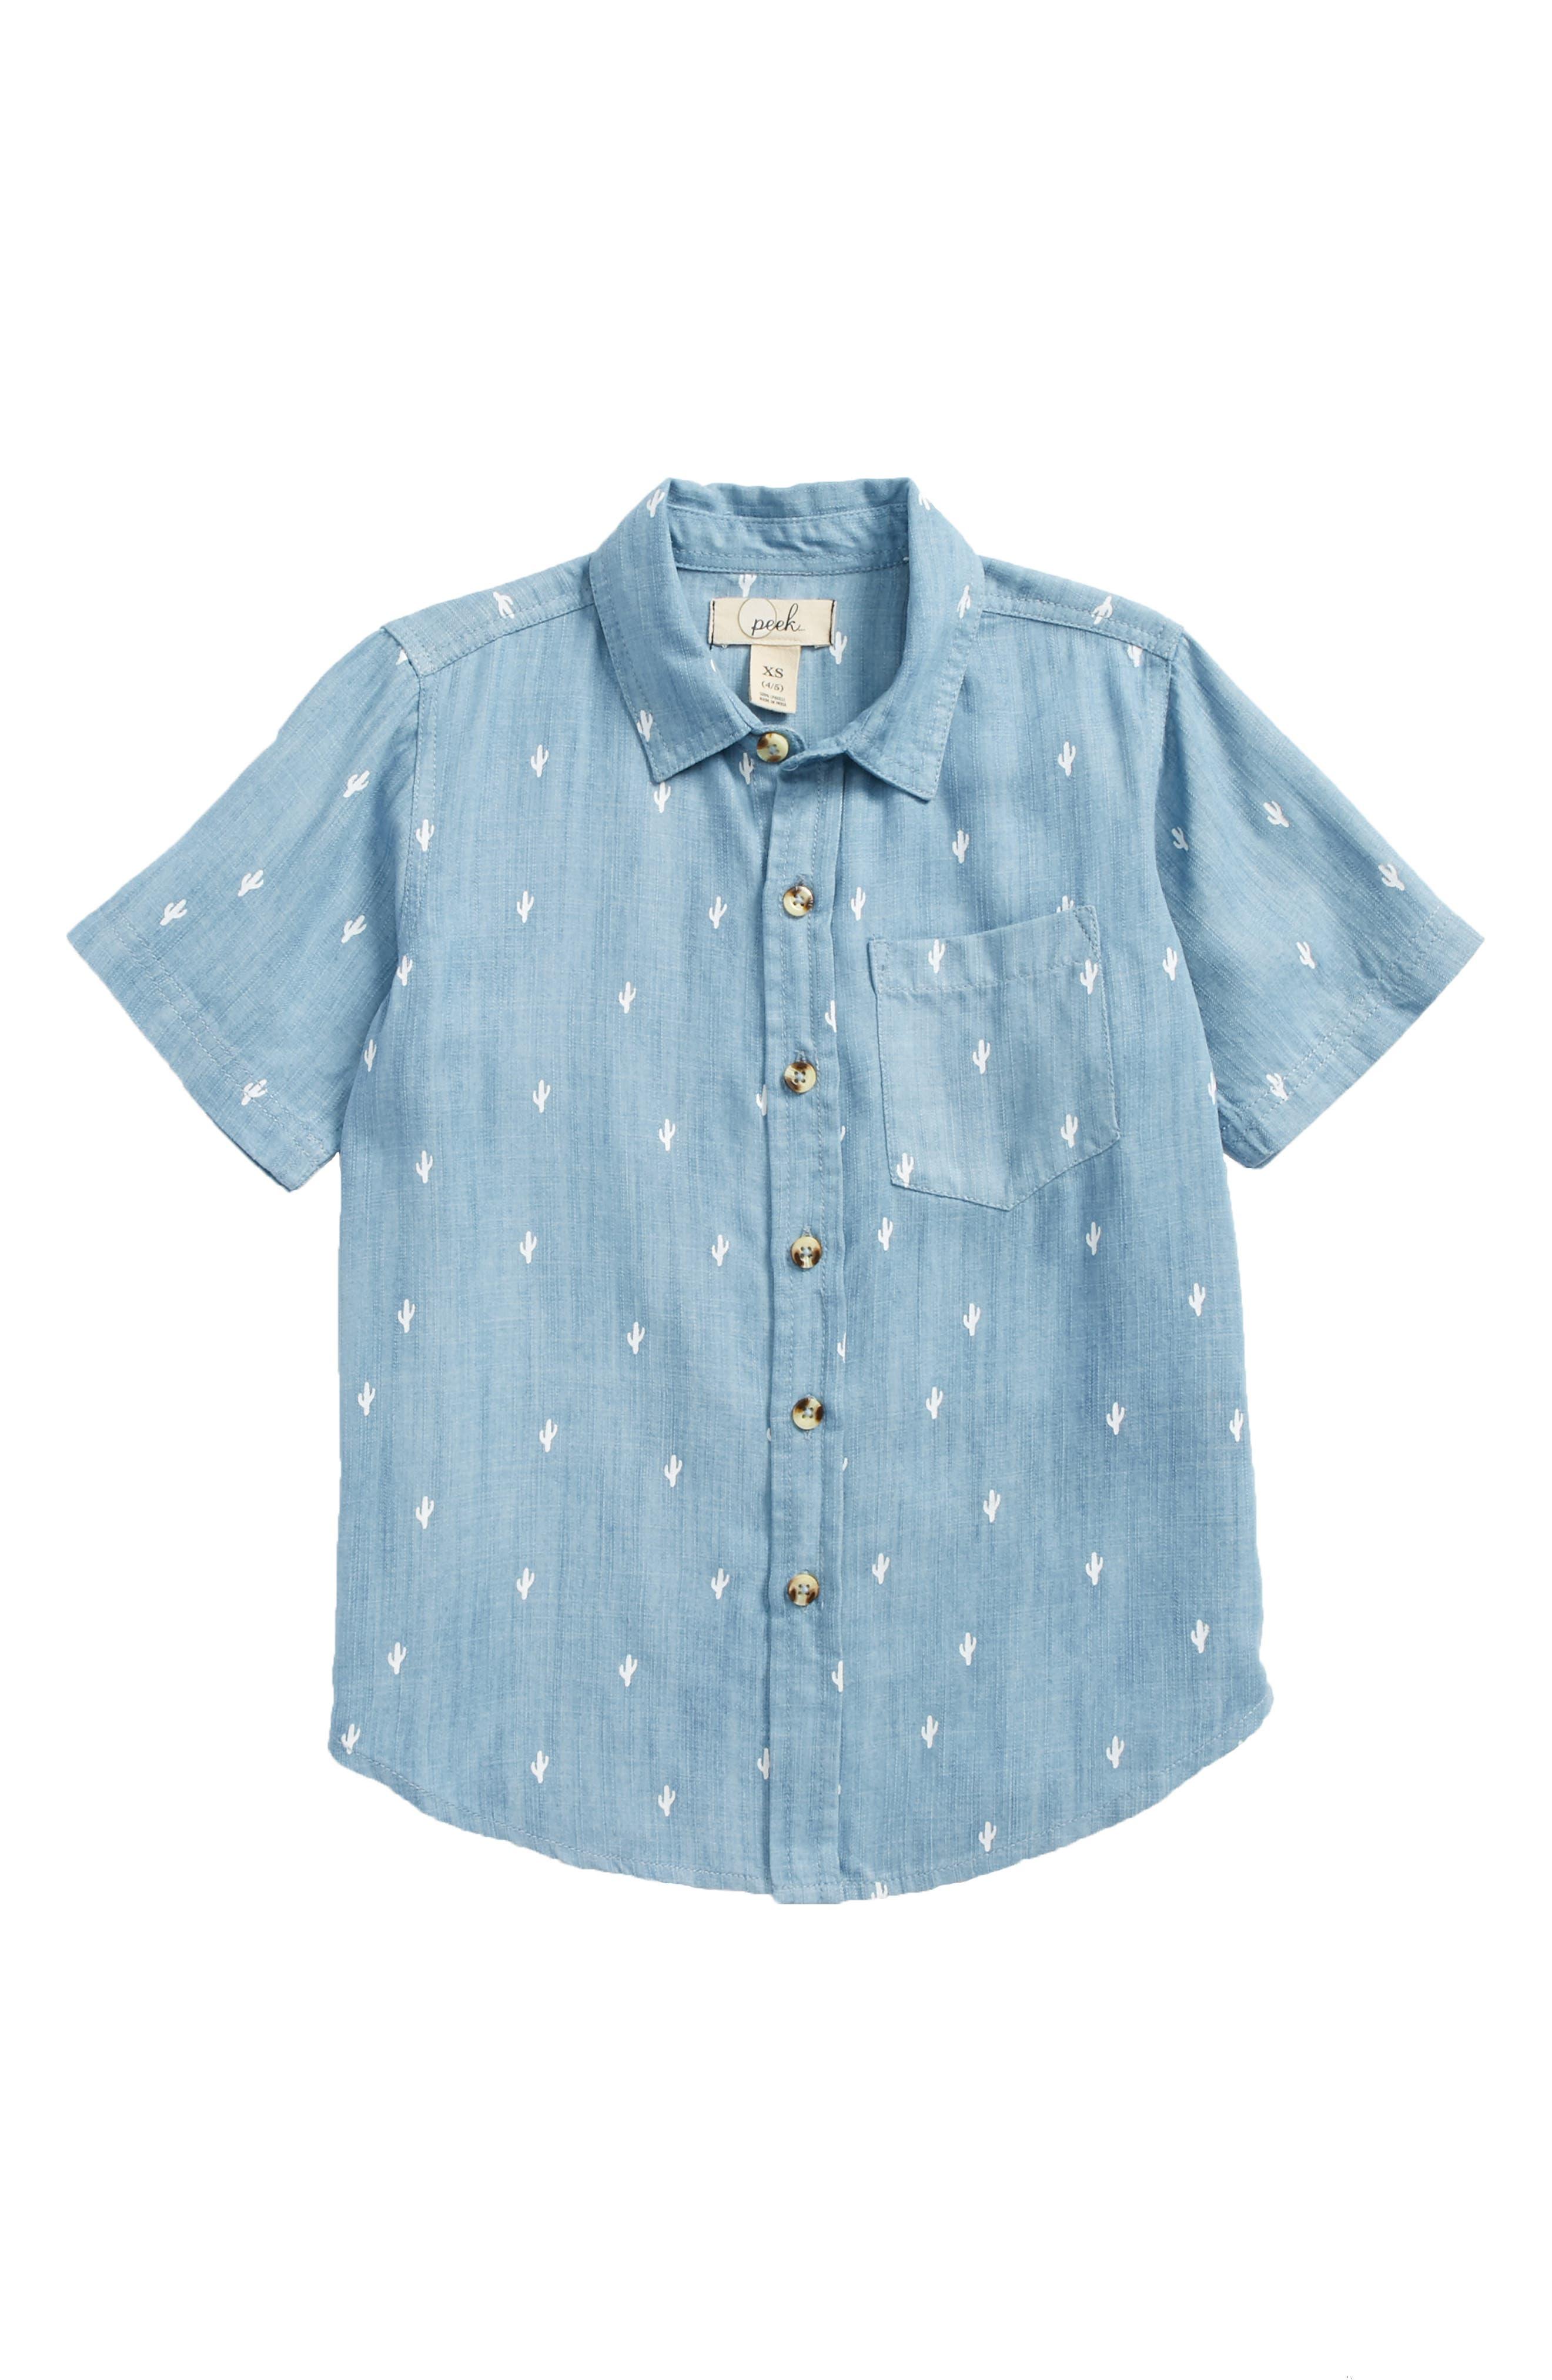 Cactus Woven Shirt,                             Main thumbnail 1, color,                             402